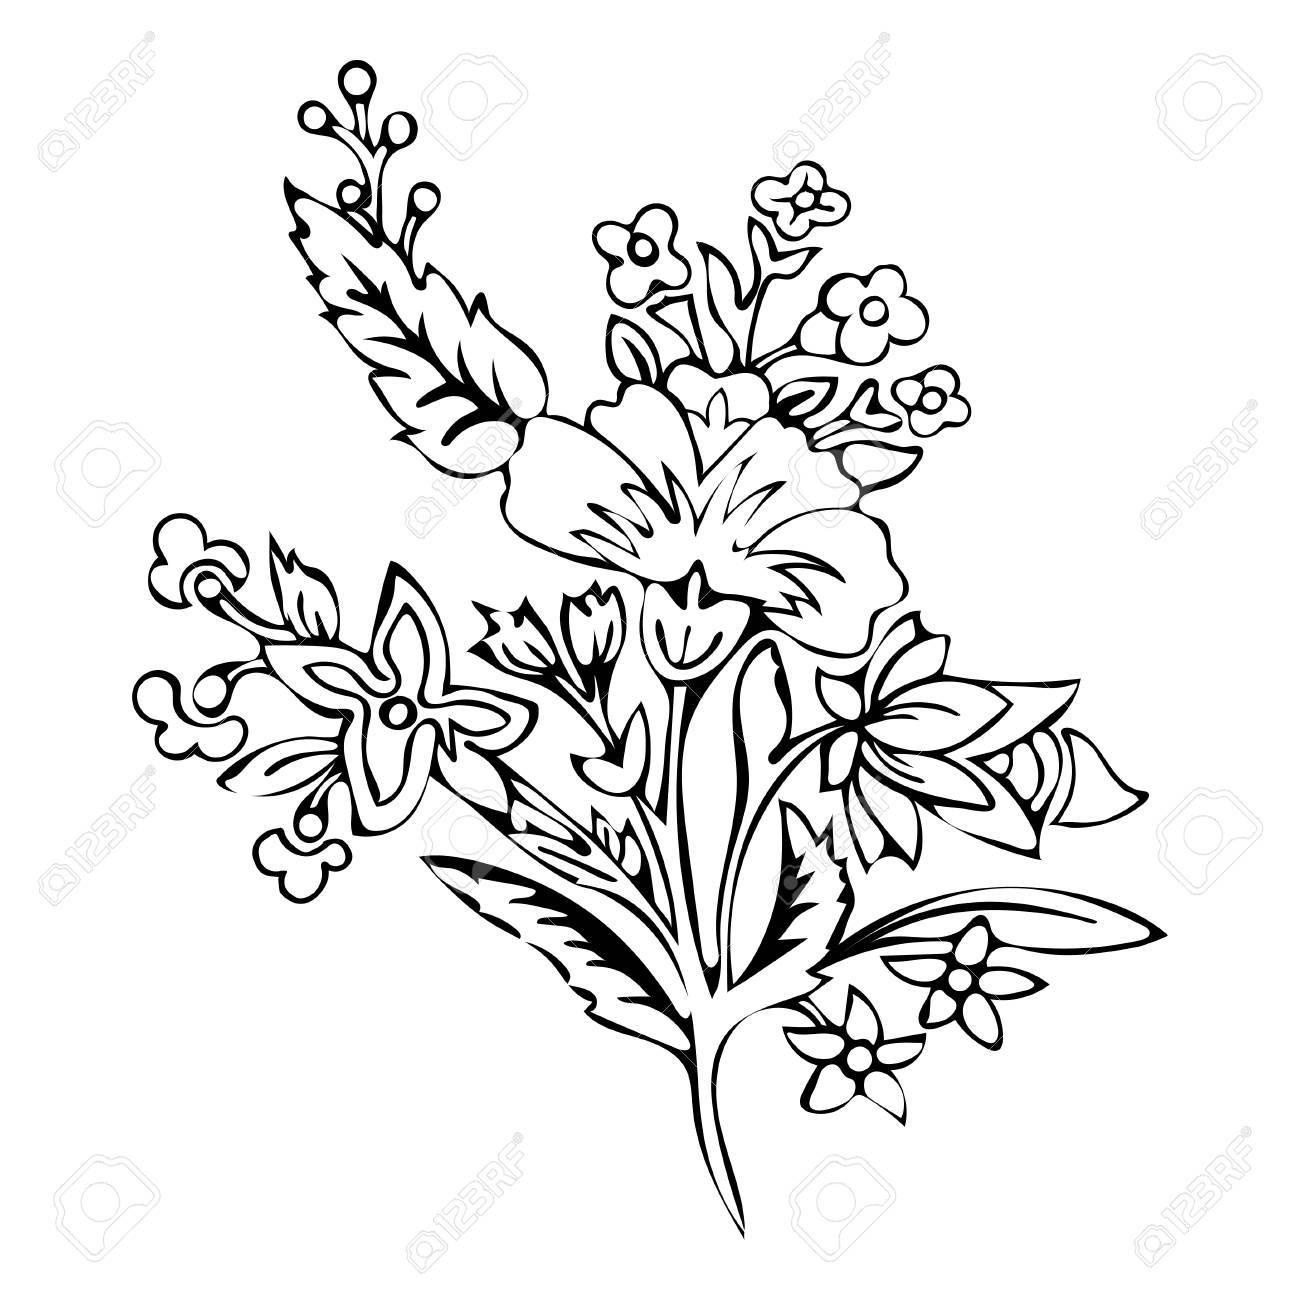 Abstrakte Blume Fantasiebl Te Ausmalbilder Skizze Monochrom